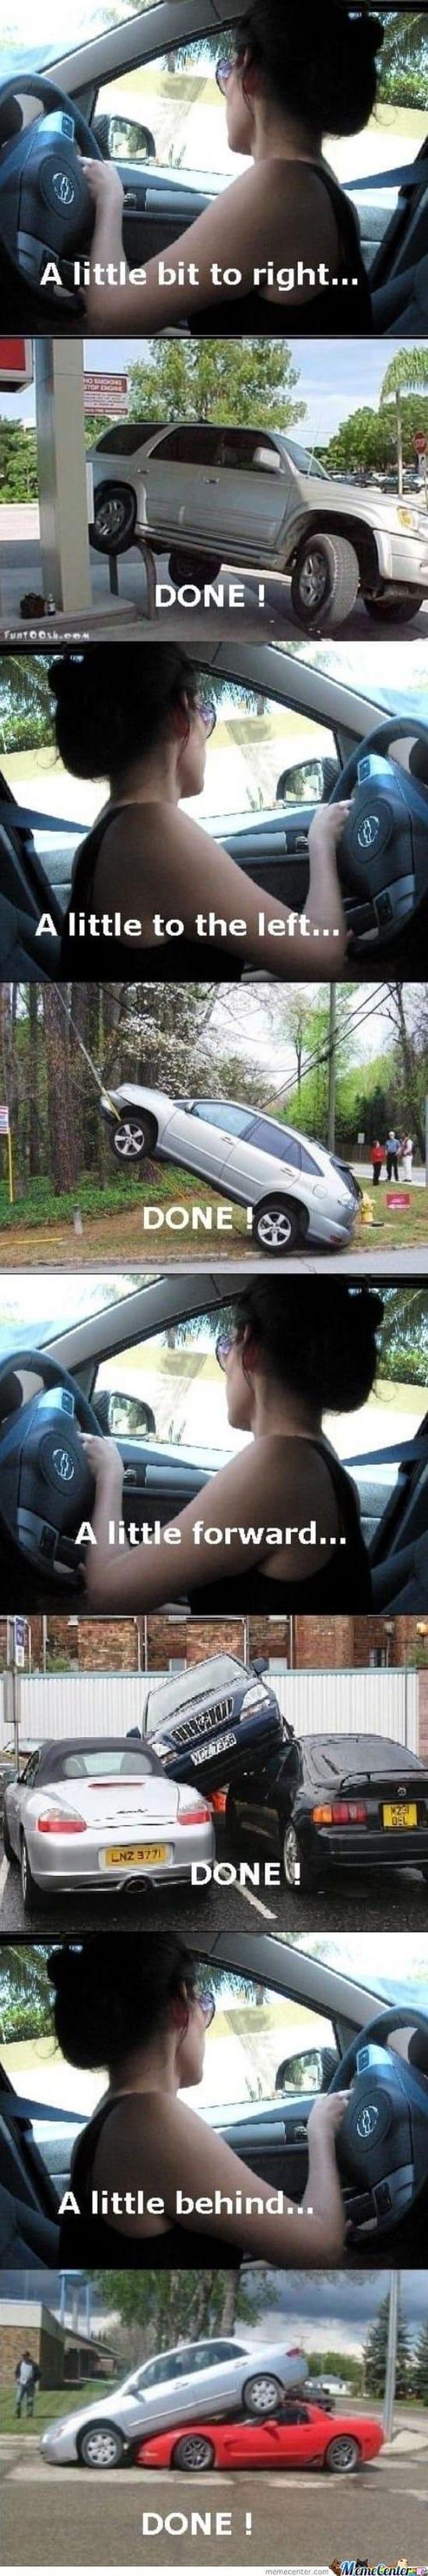 women-parking